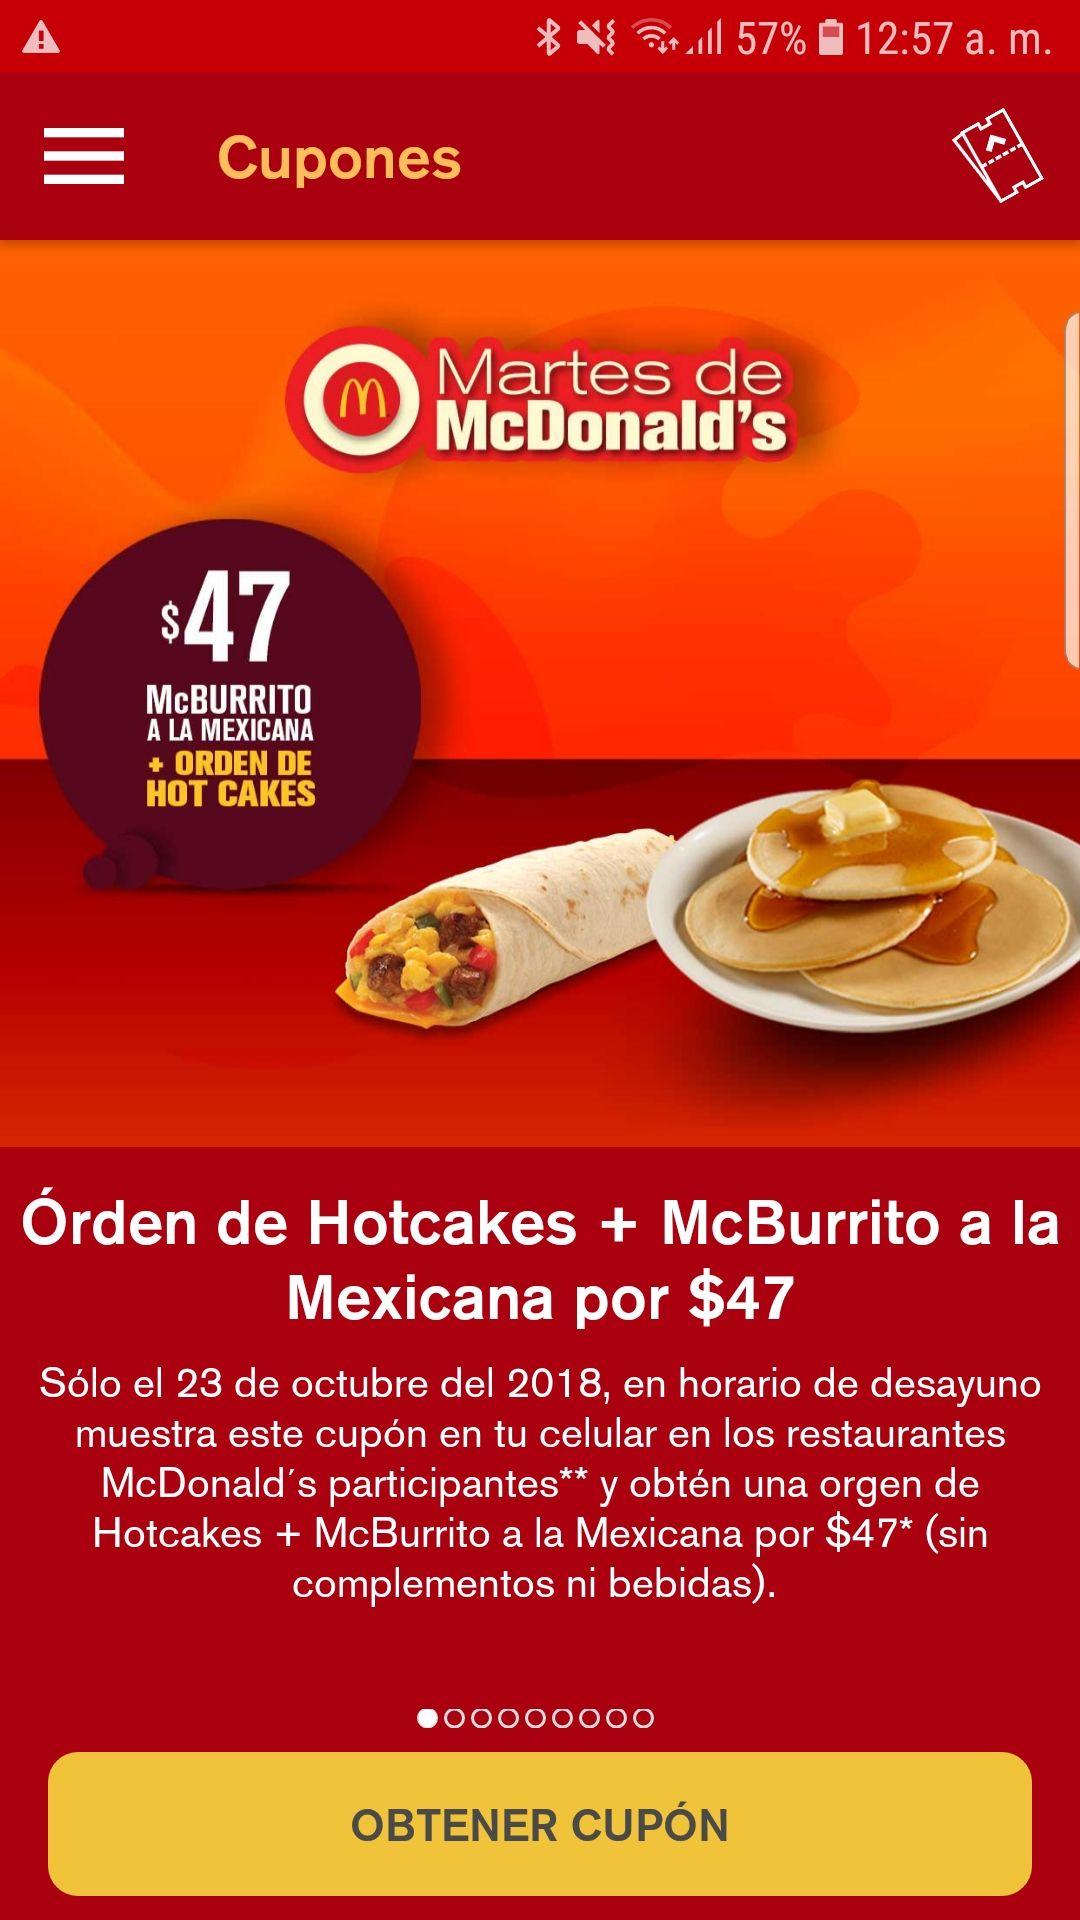 McDonald's desayuno del martes 23 de octubre 2018